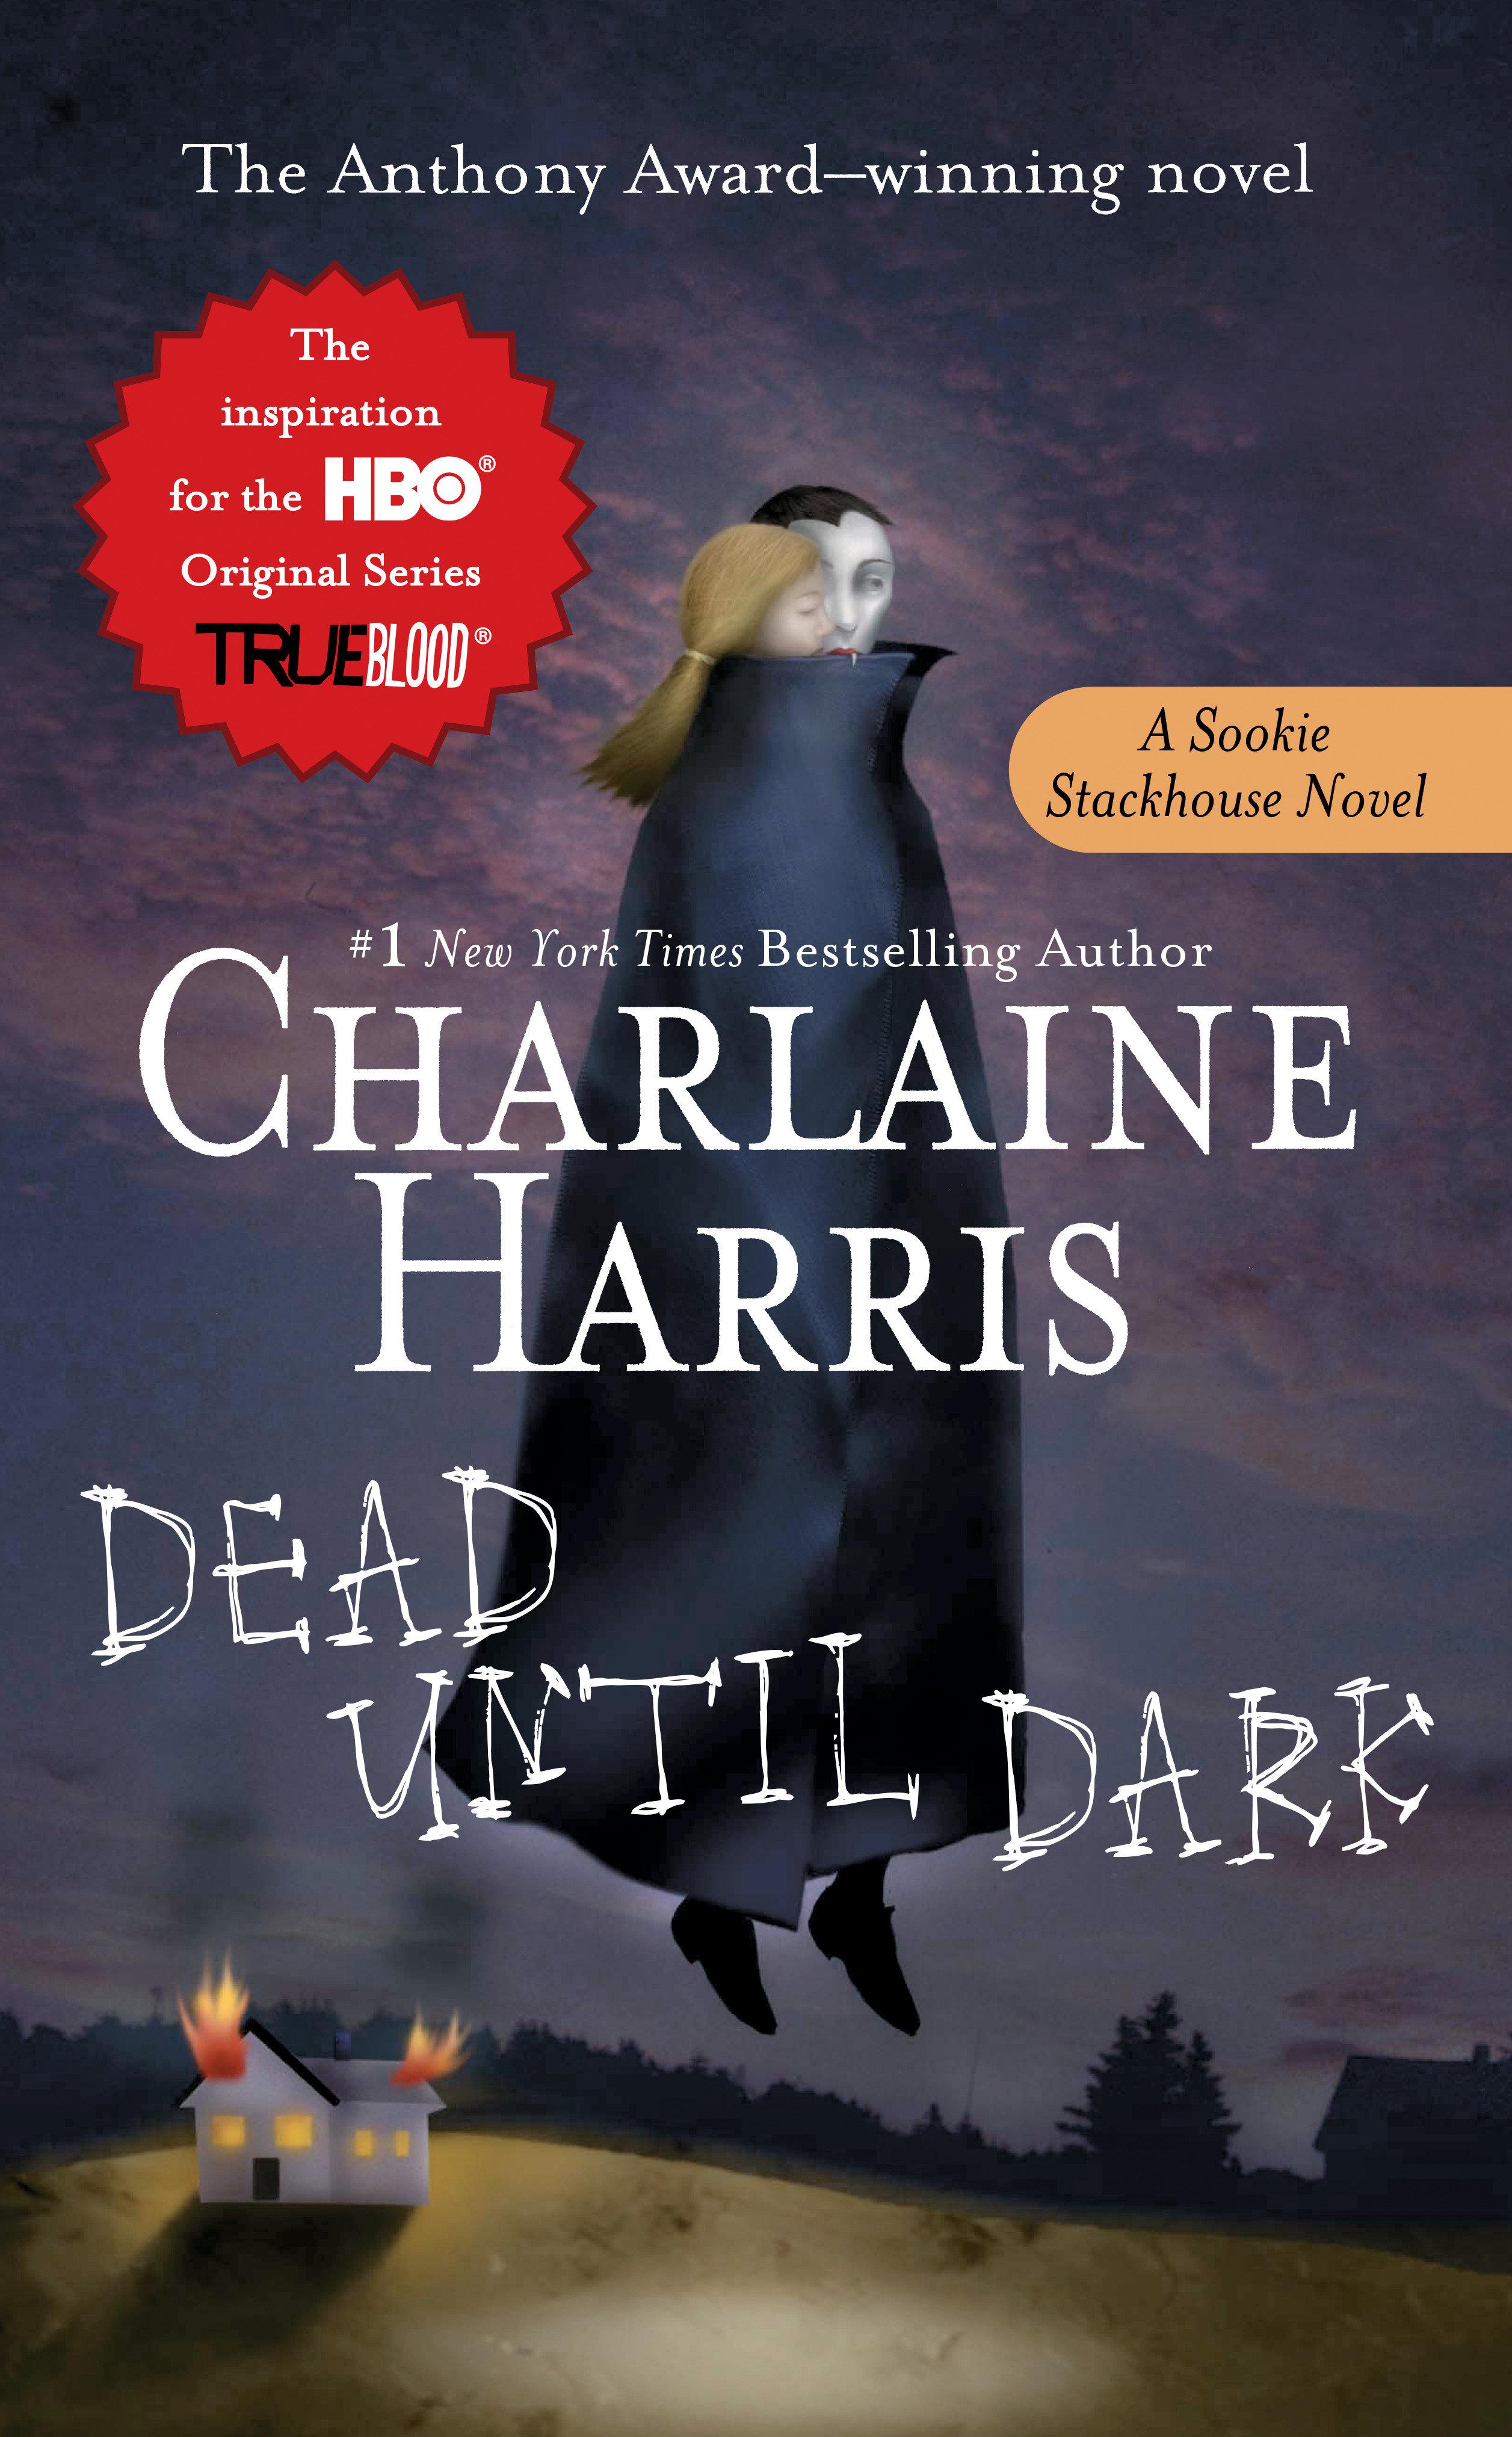 Dead until dark cover image